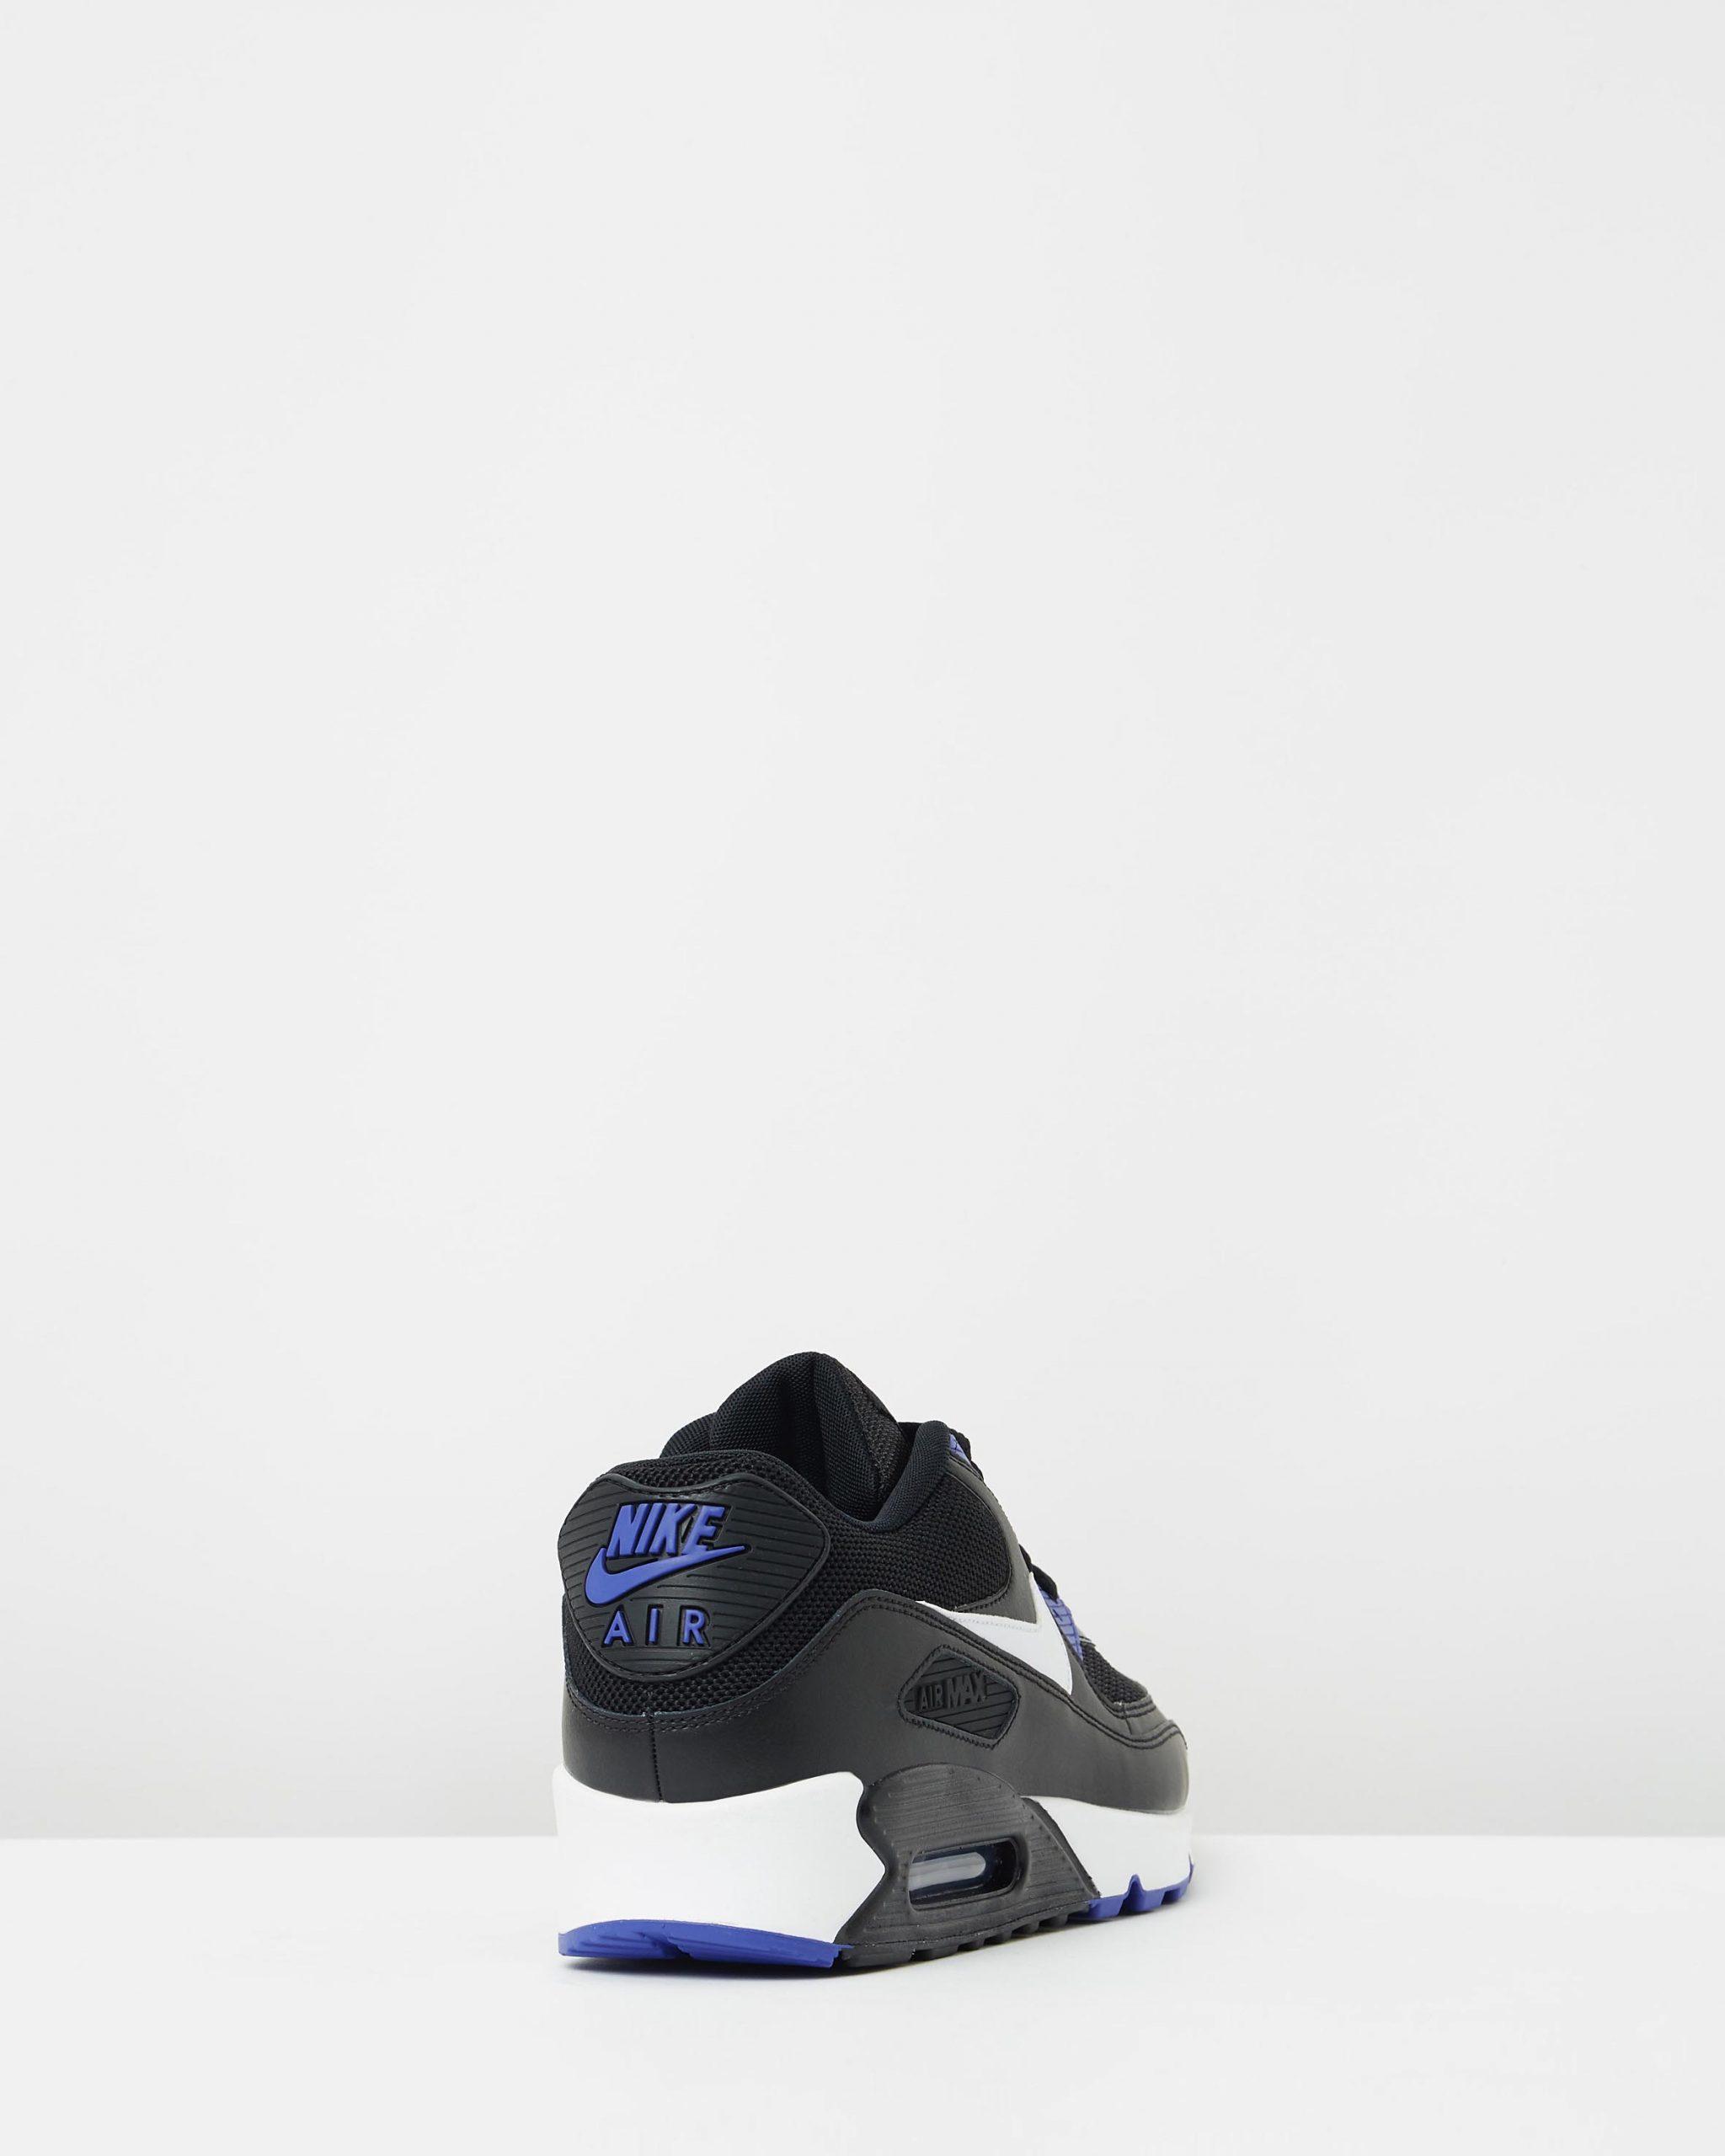 Nike Air Max 90 Essential Black White Persian Violet 95gallery Com